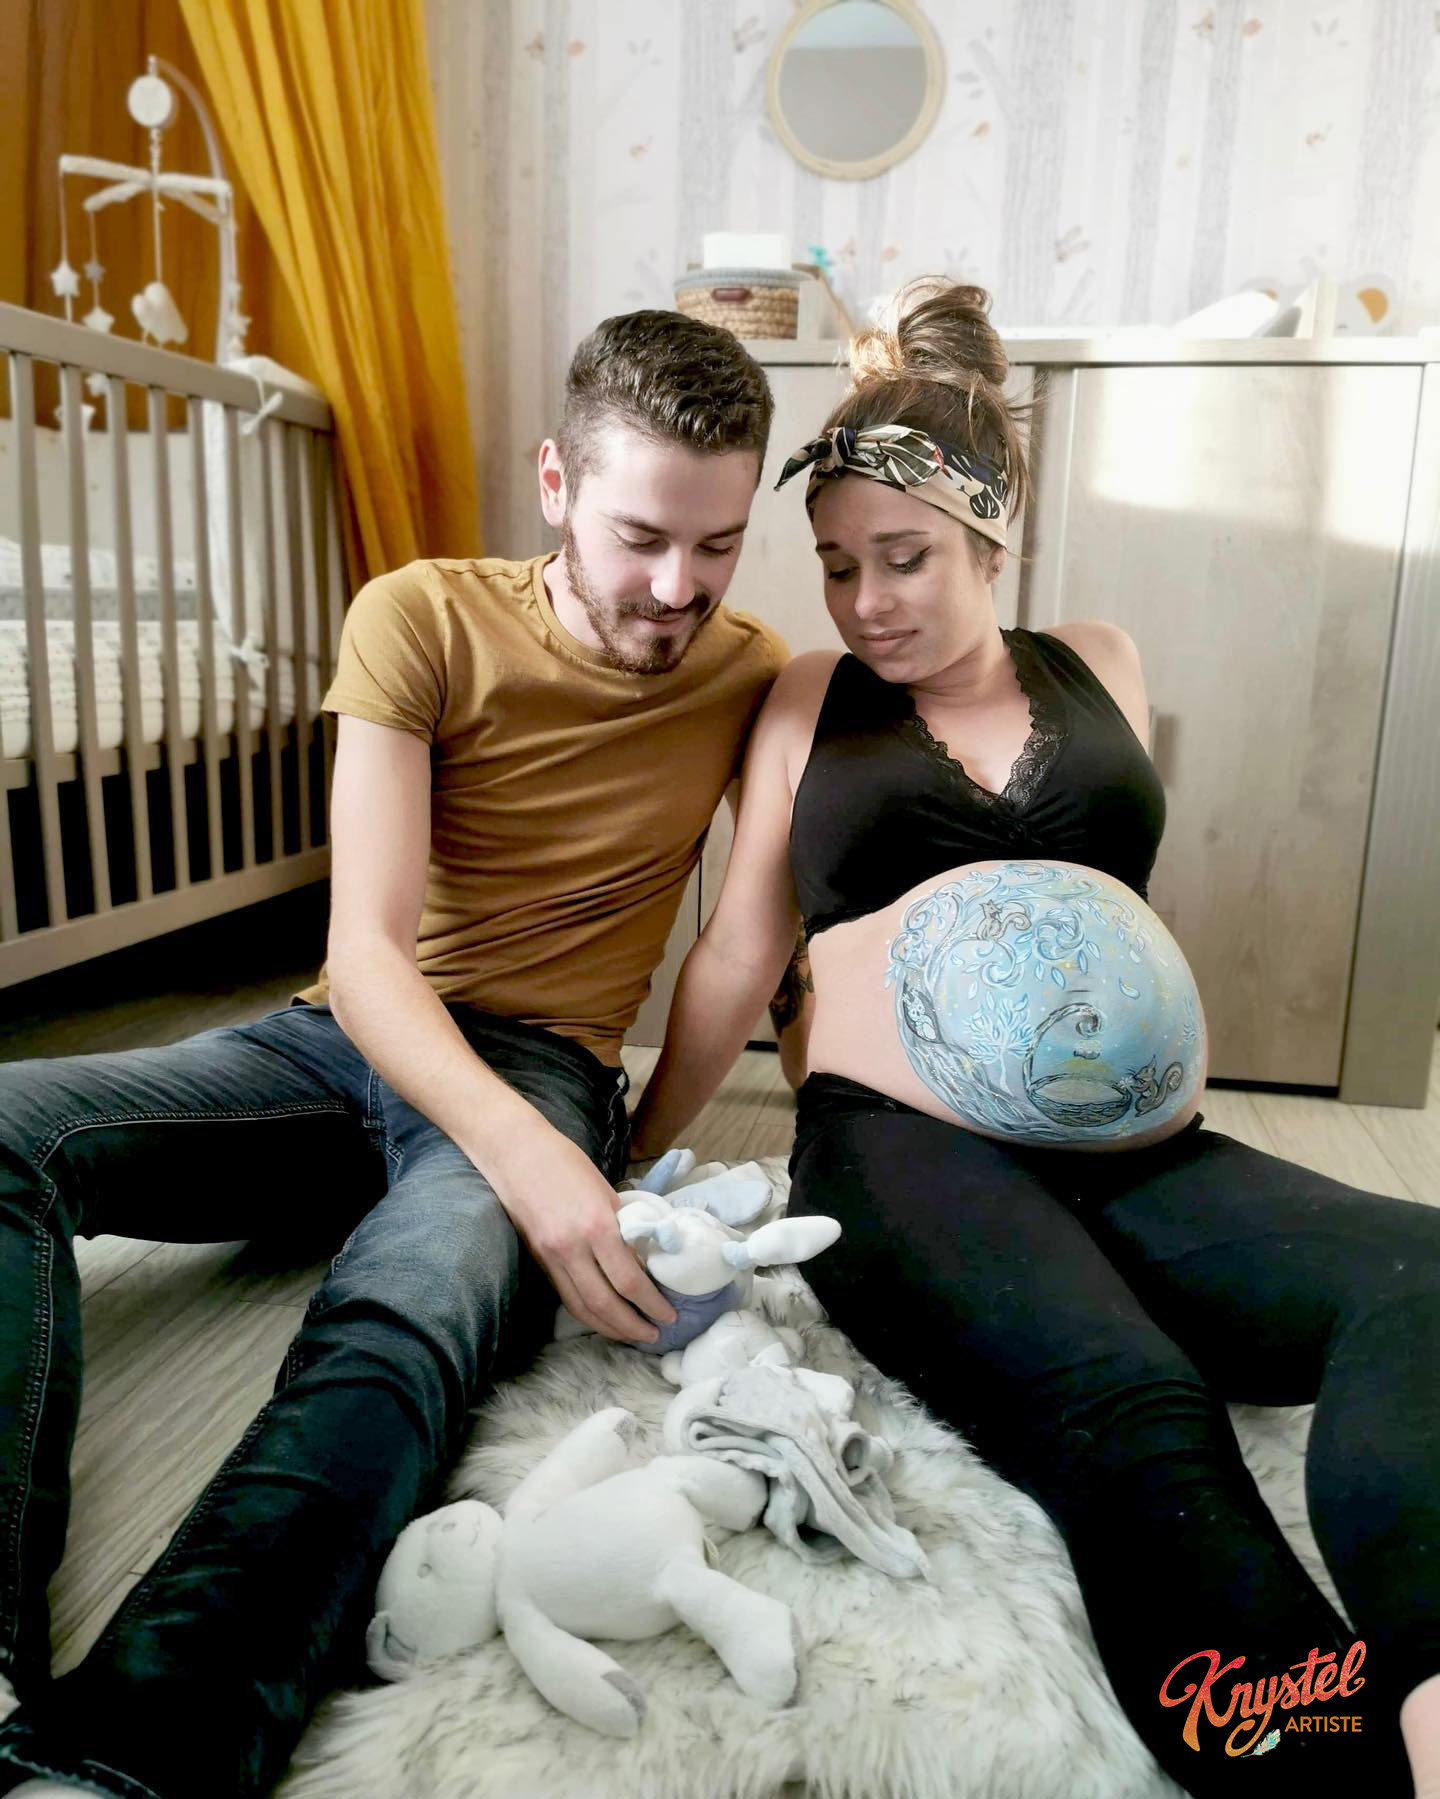 séance art prénatal, vendée